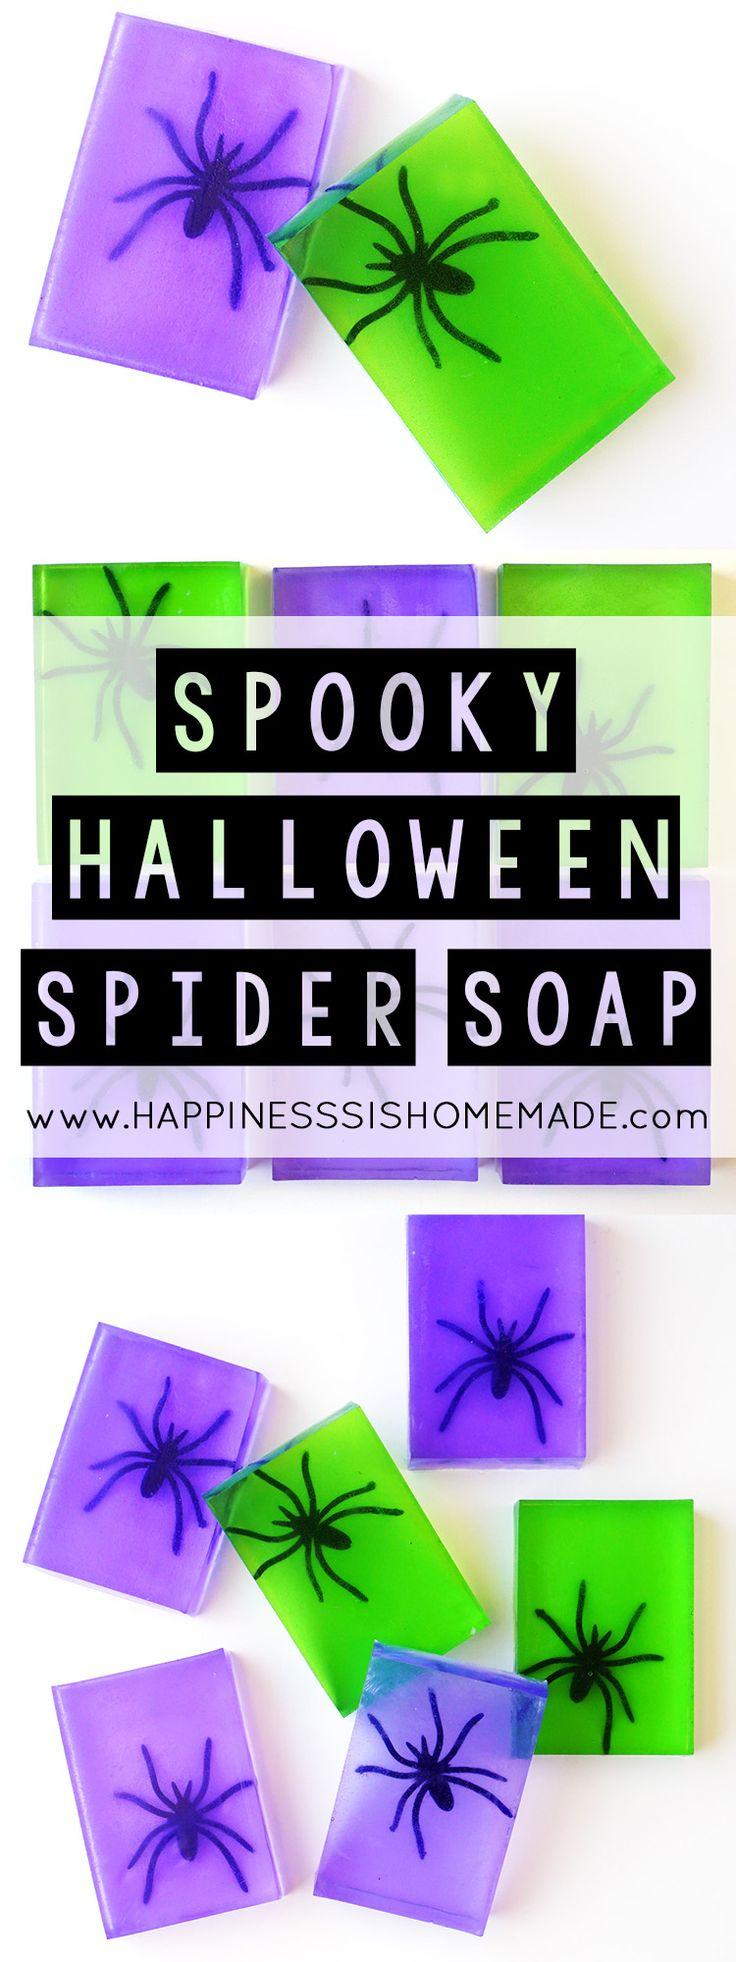 Spooky Spider Soap Halloween Craft